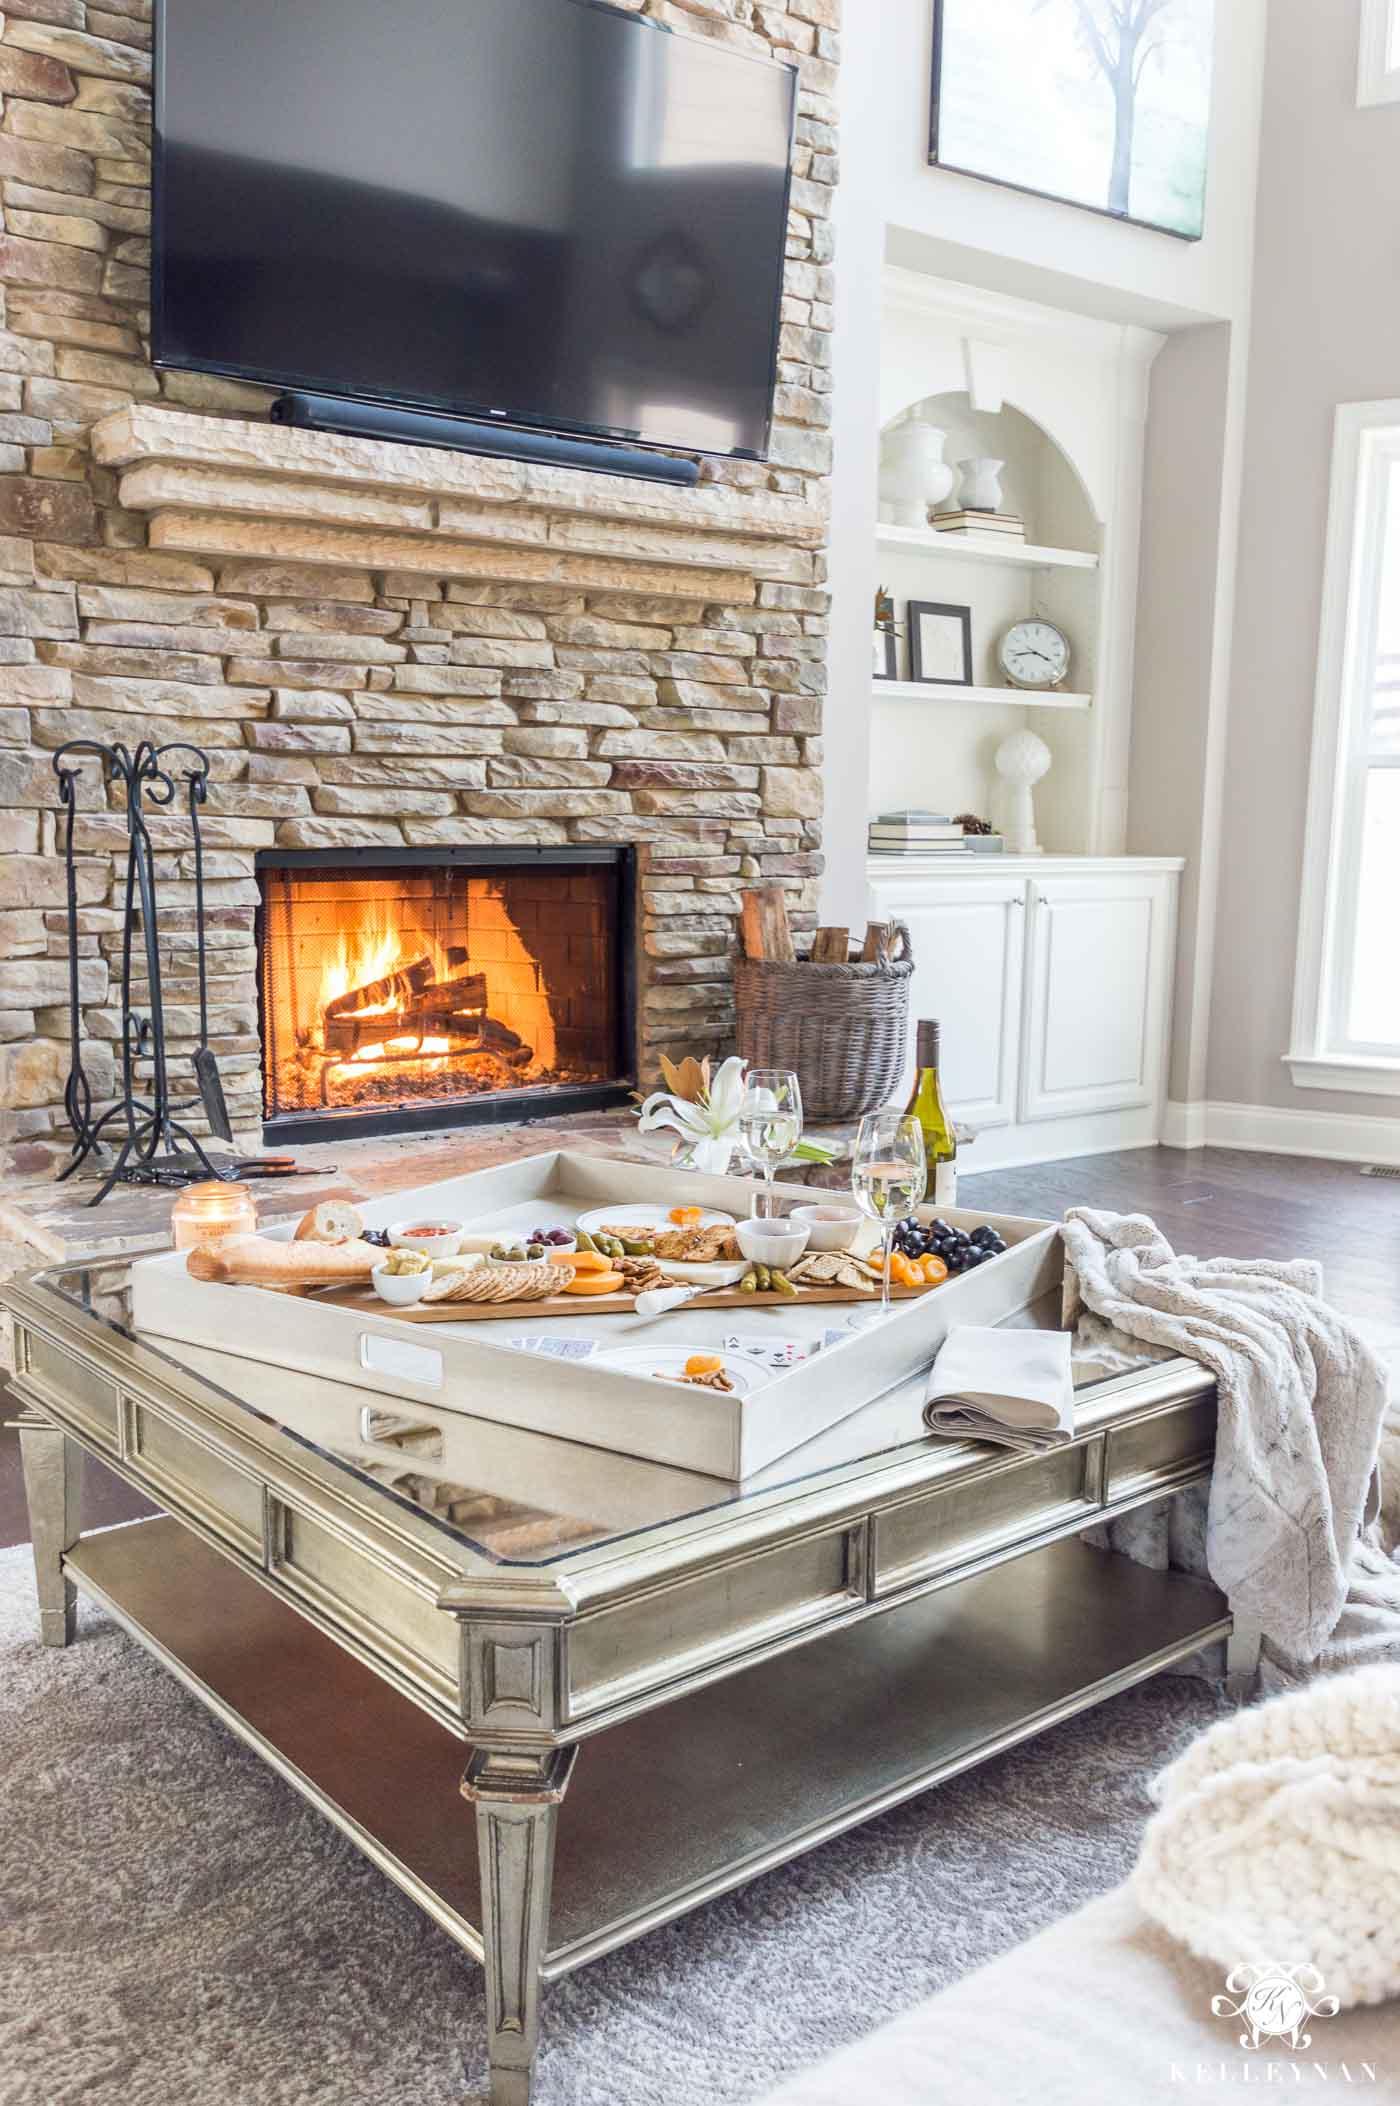 restoration hardware sectional sofa linen turner art van kelley nan's home furniture: top inquiries